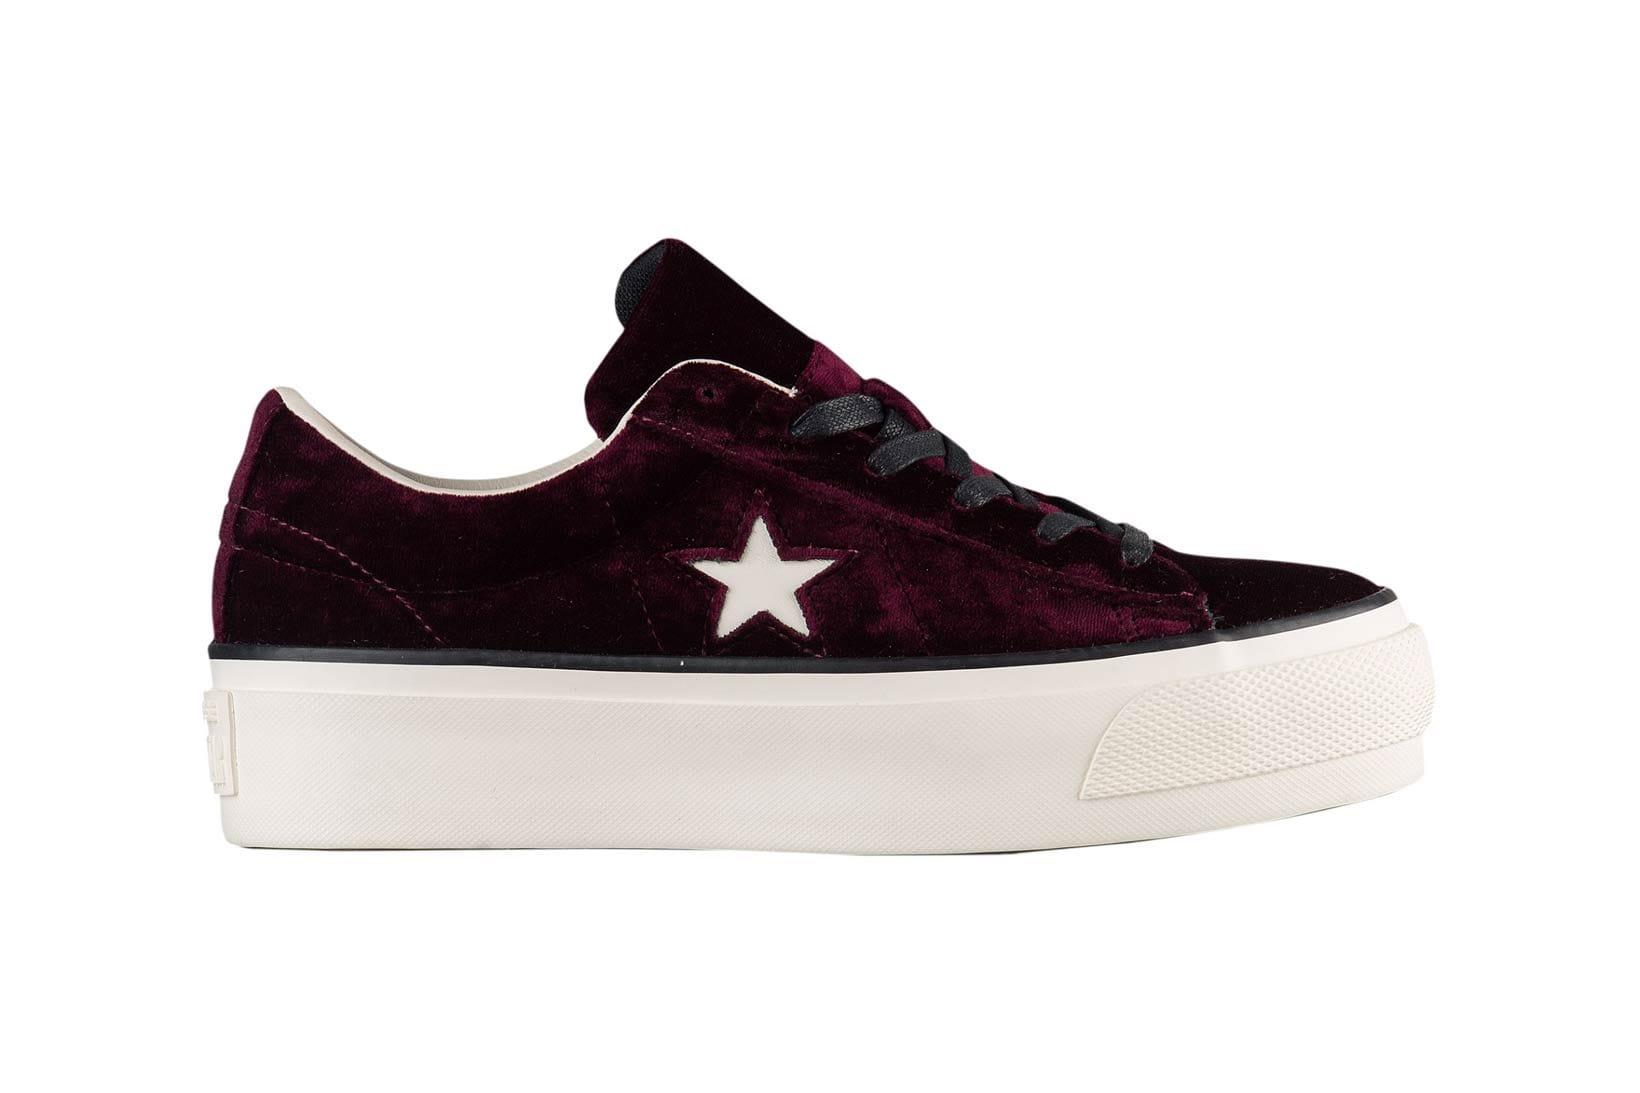 Converse One Star Platform Ox in